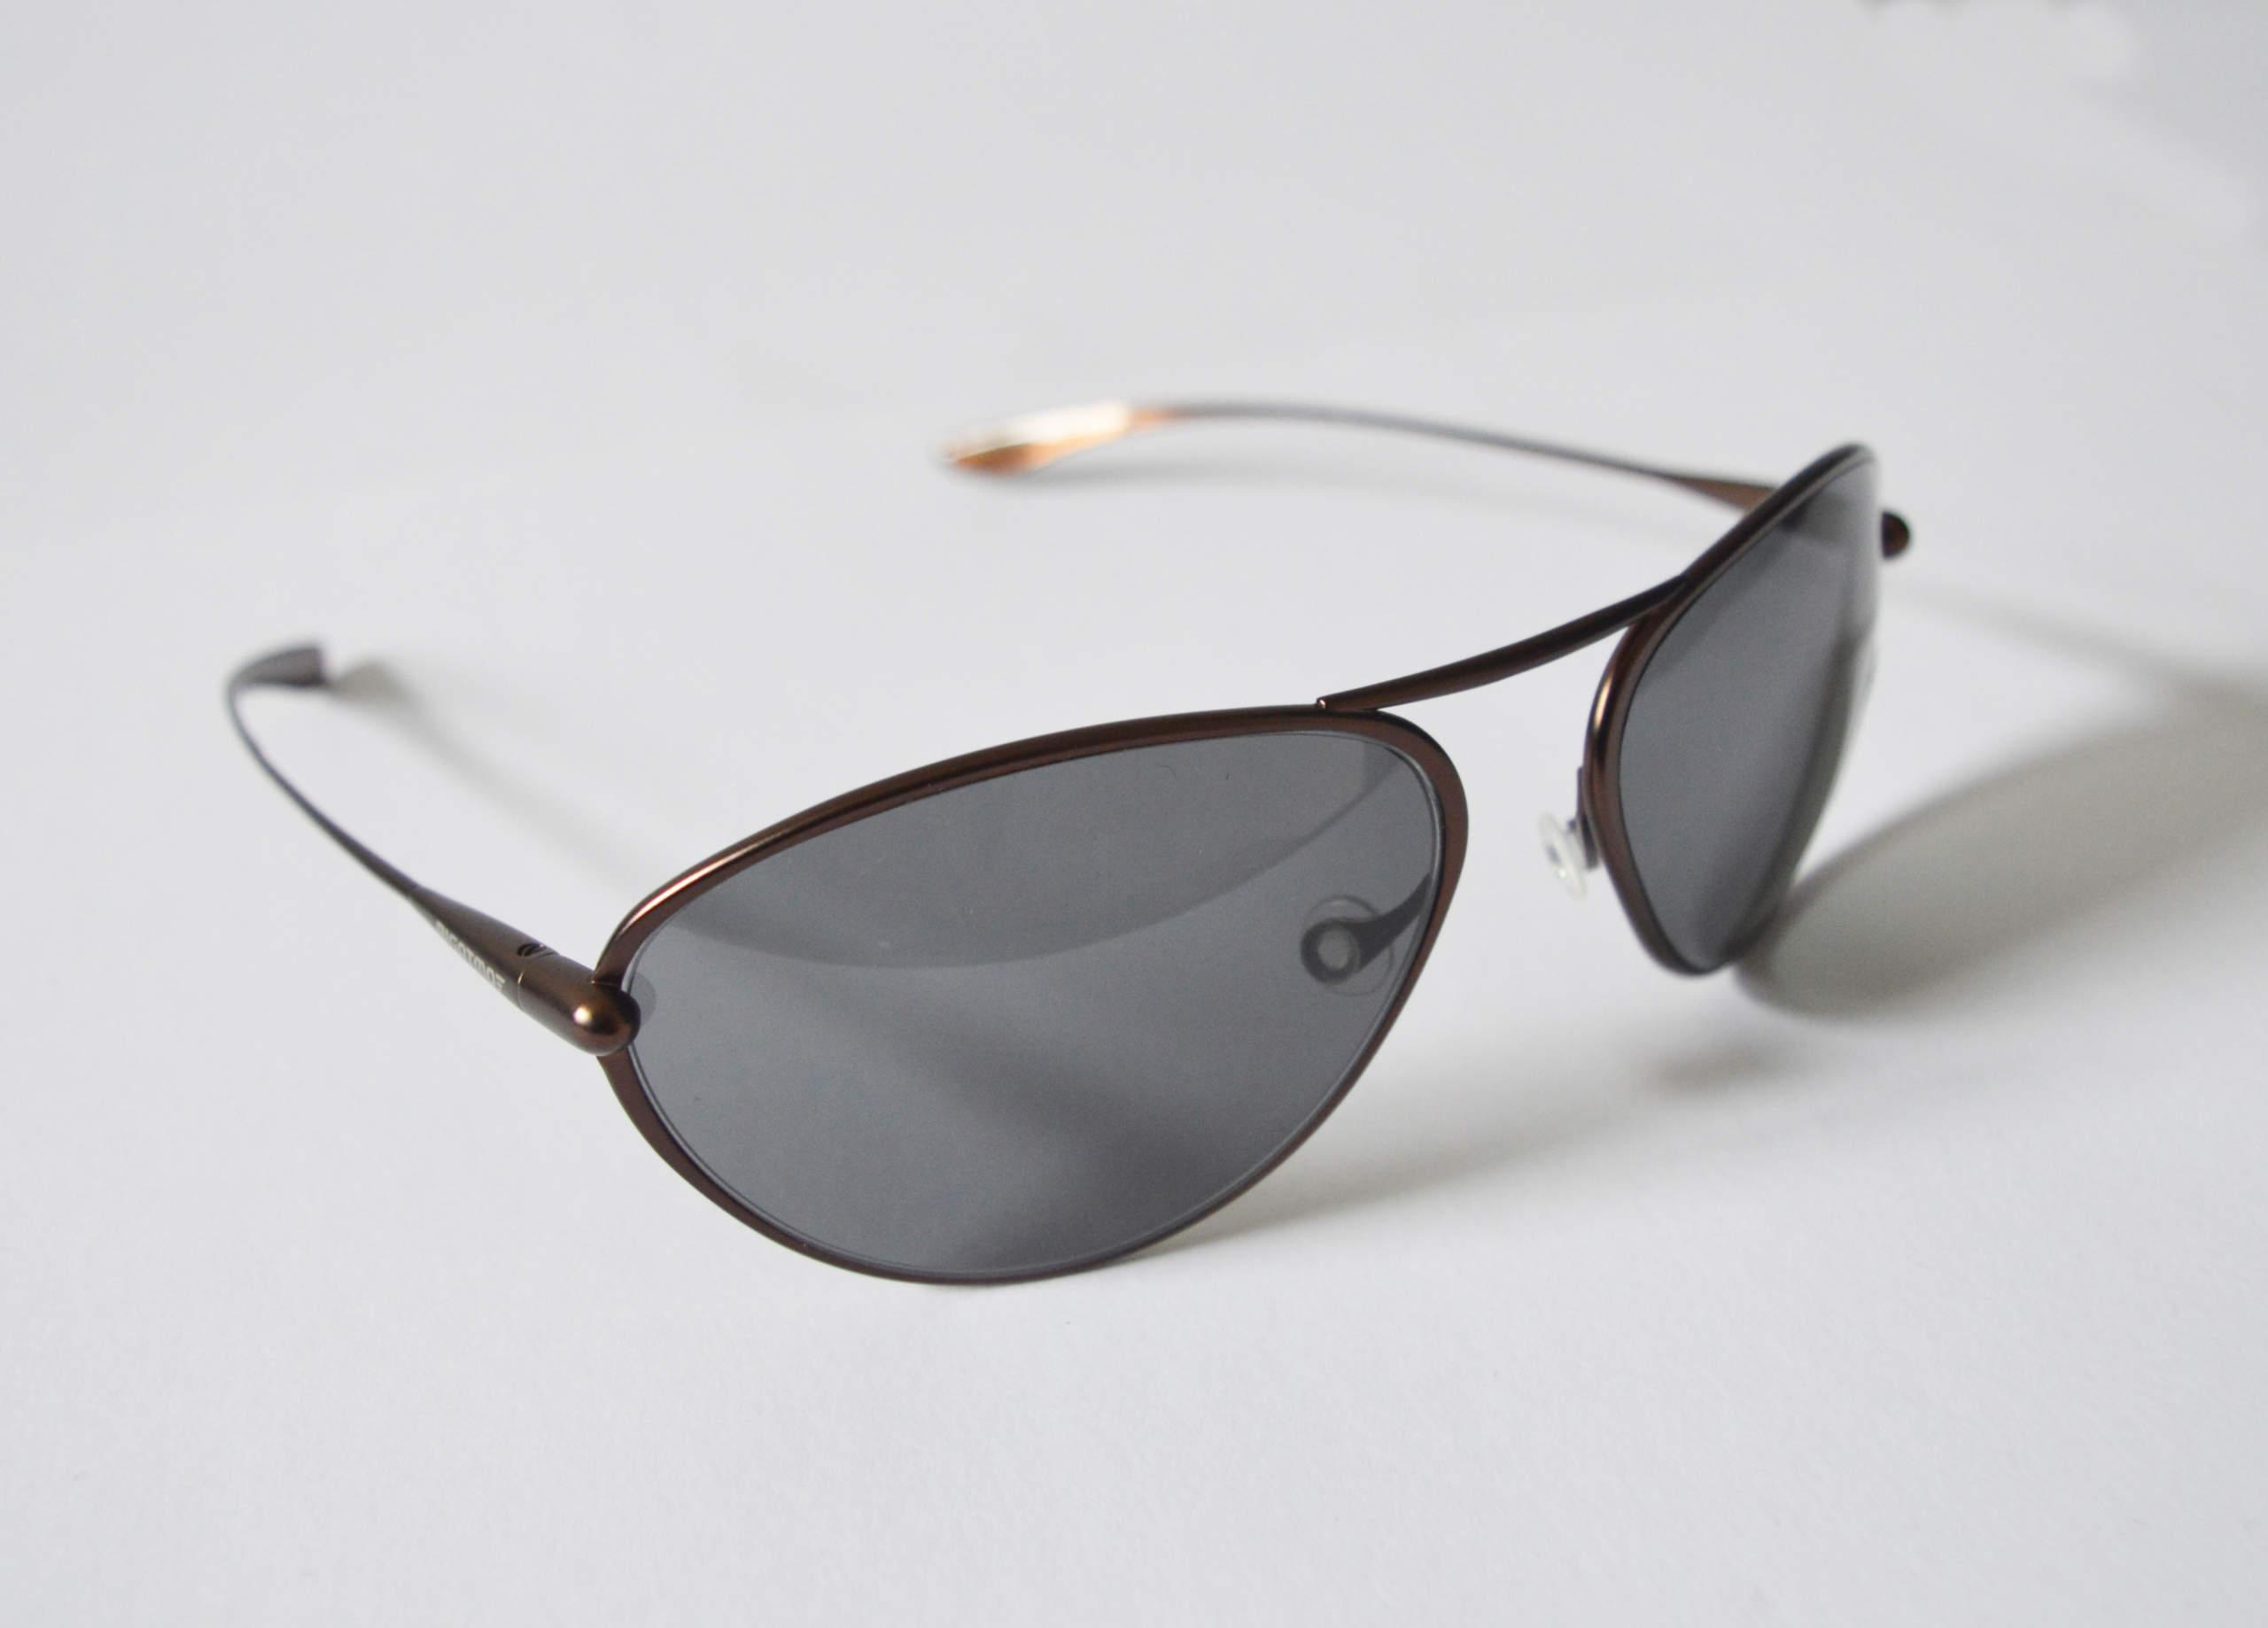 Tropo - Brunello Titanium Frame High-Contrast Sunglasses